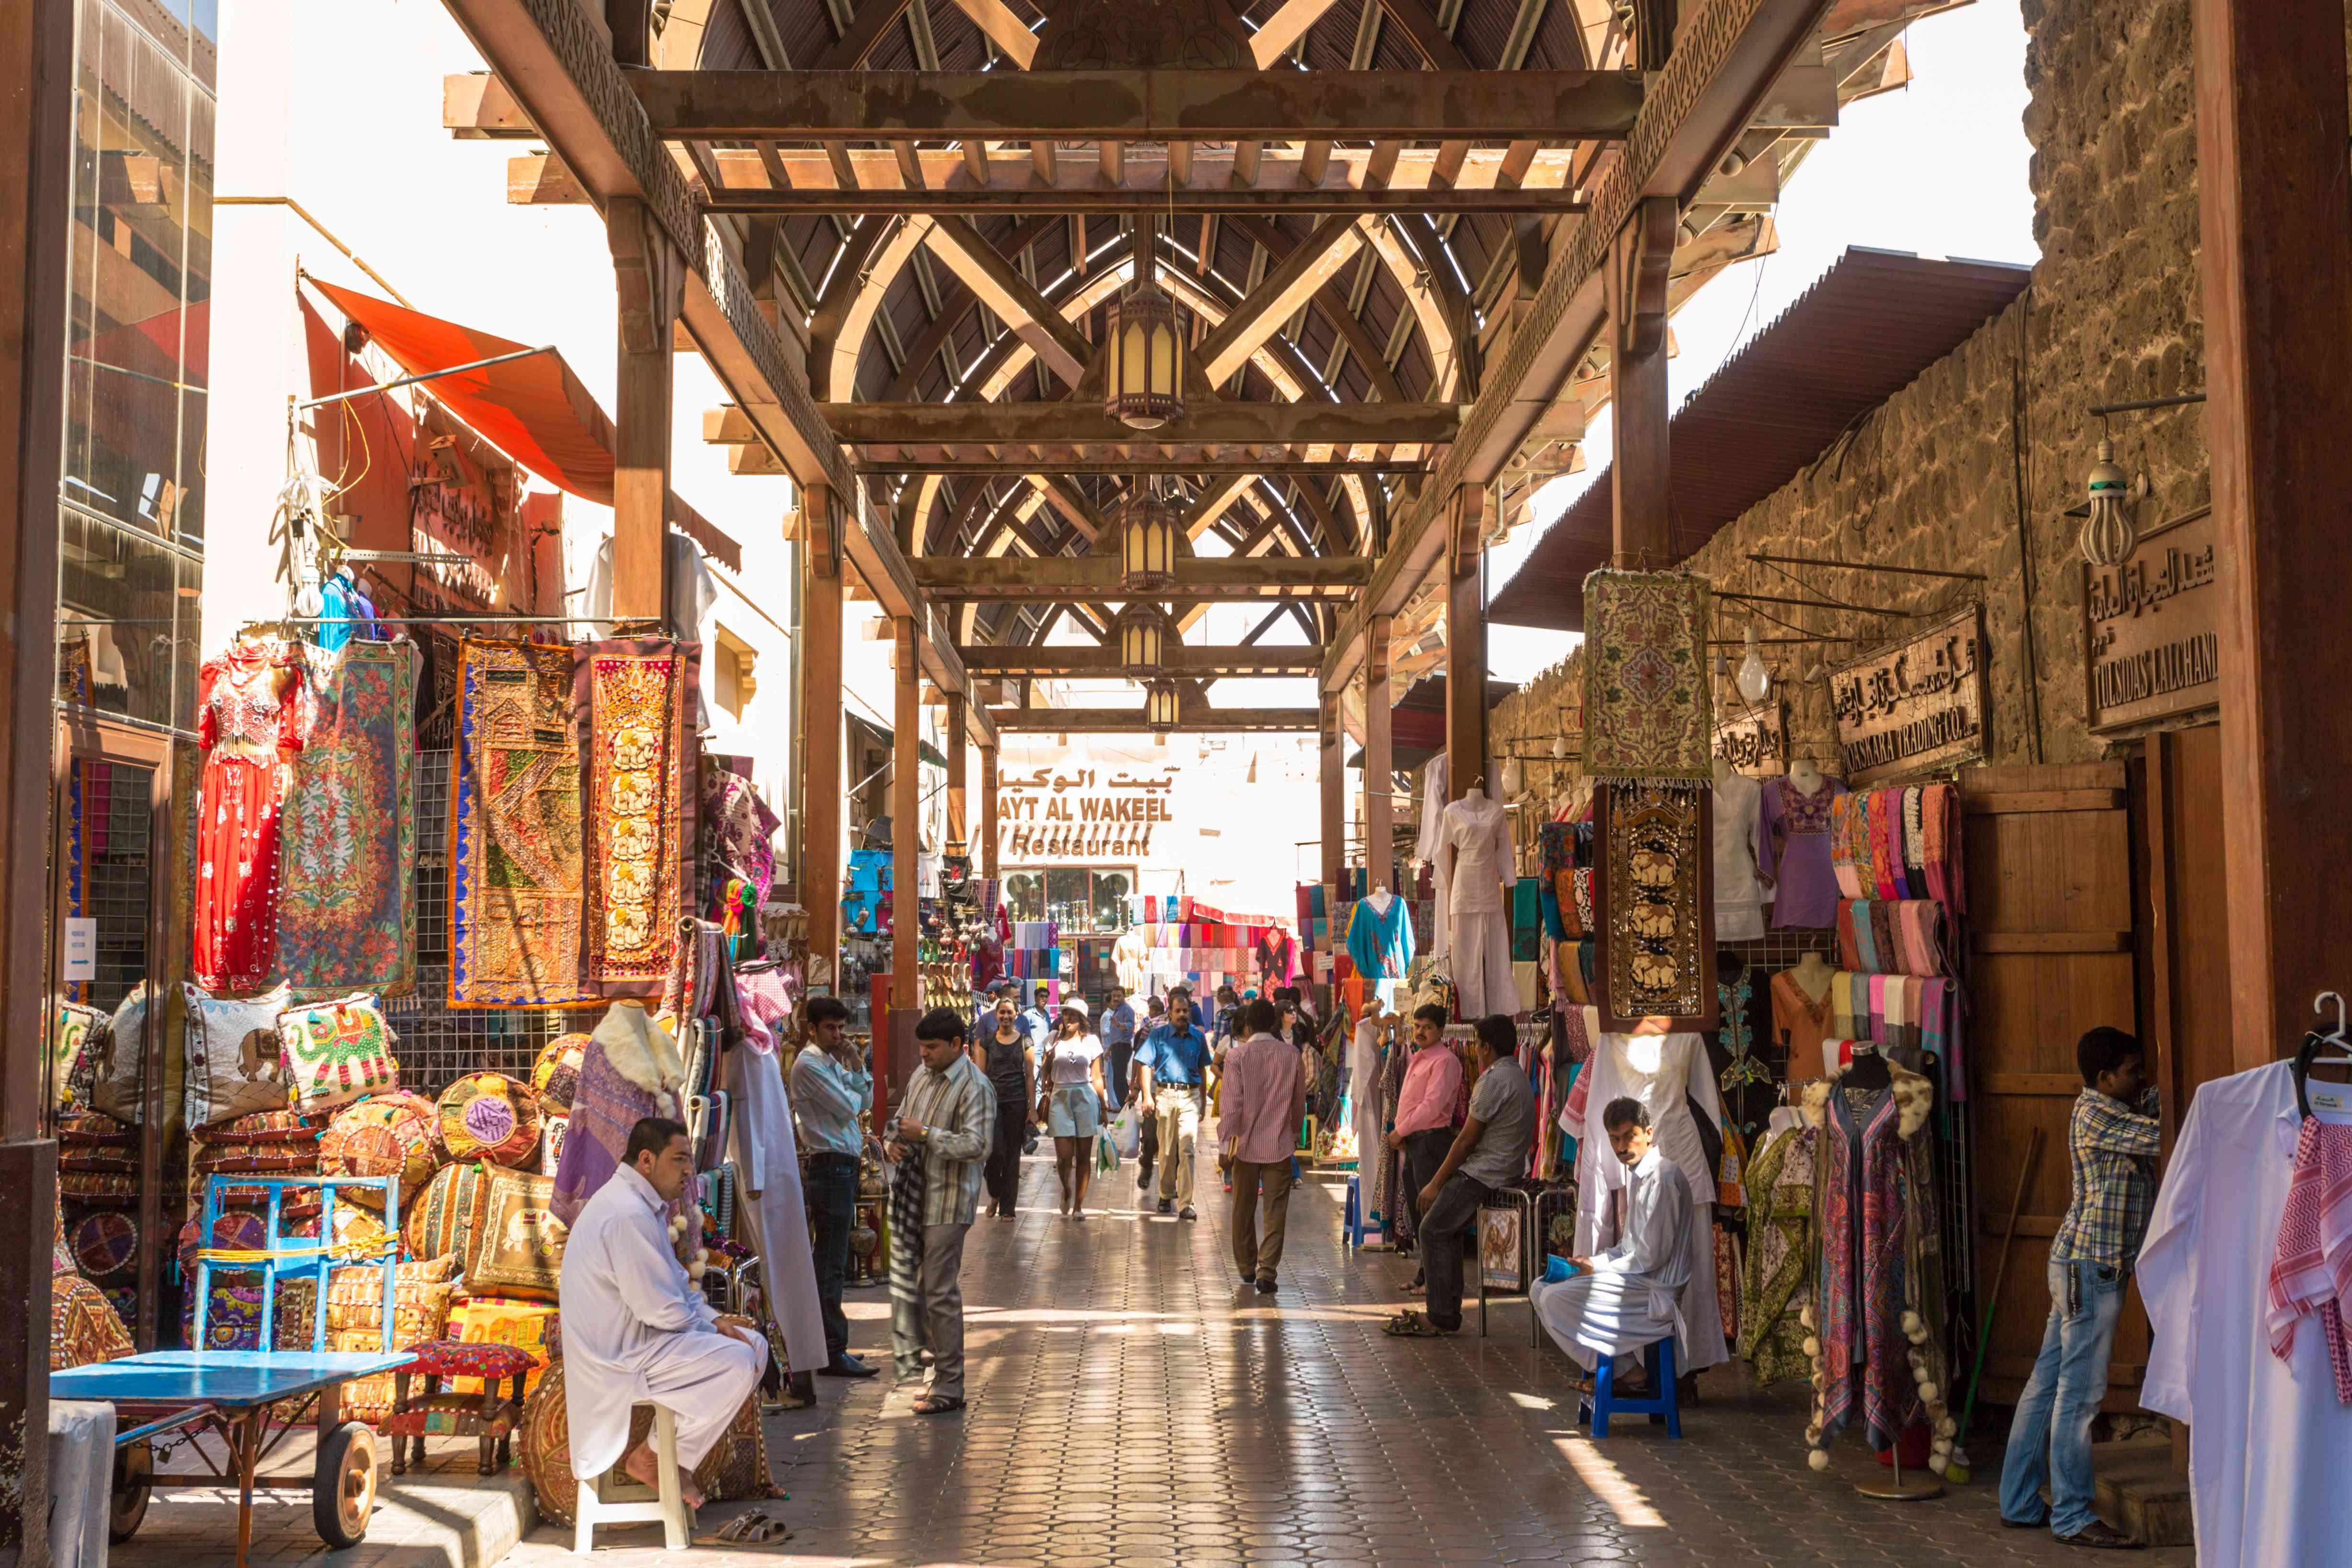 Textile souk crowded with people, Bur Dubai, UAE